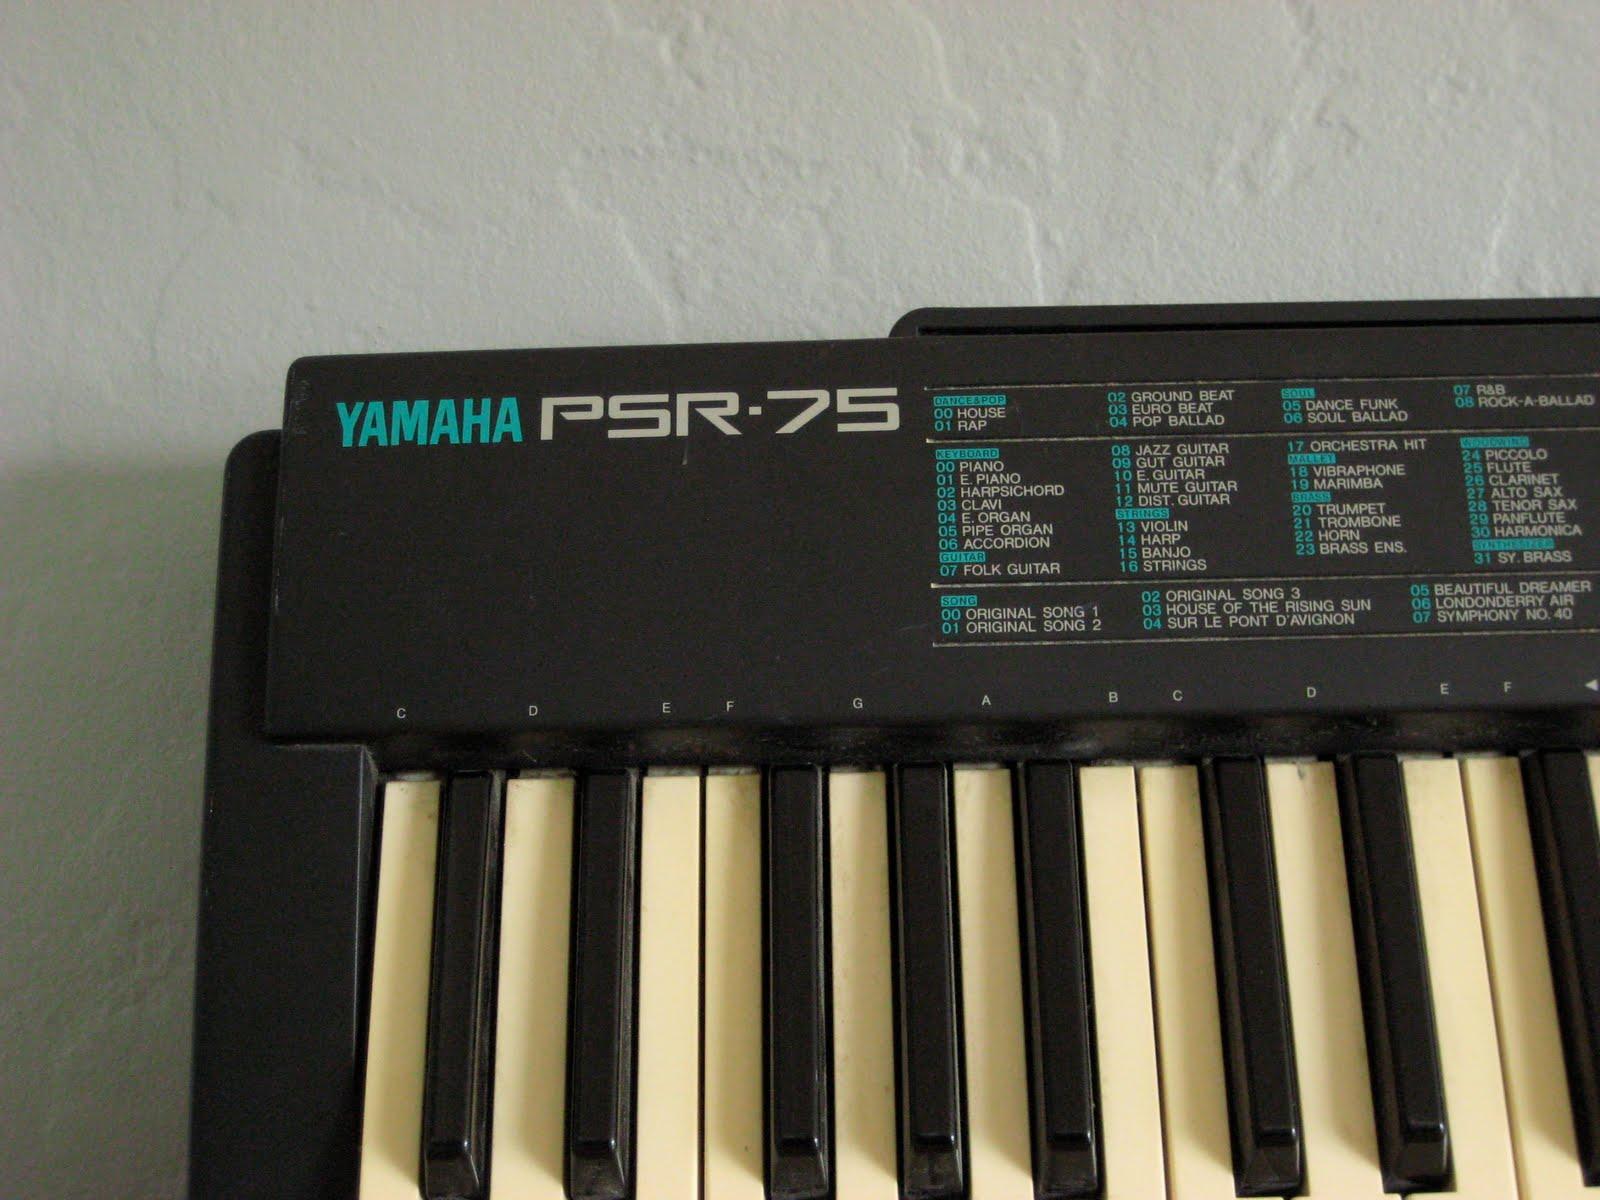 Mat & Mog's Shop: Yamaha PSR-75 Electric Keyboard $40